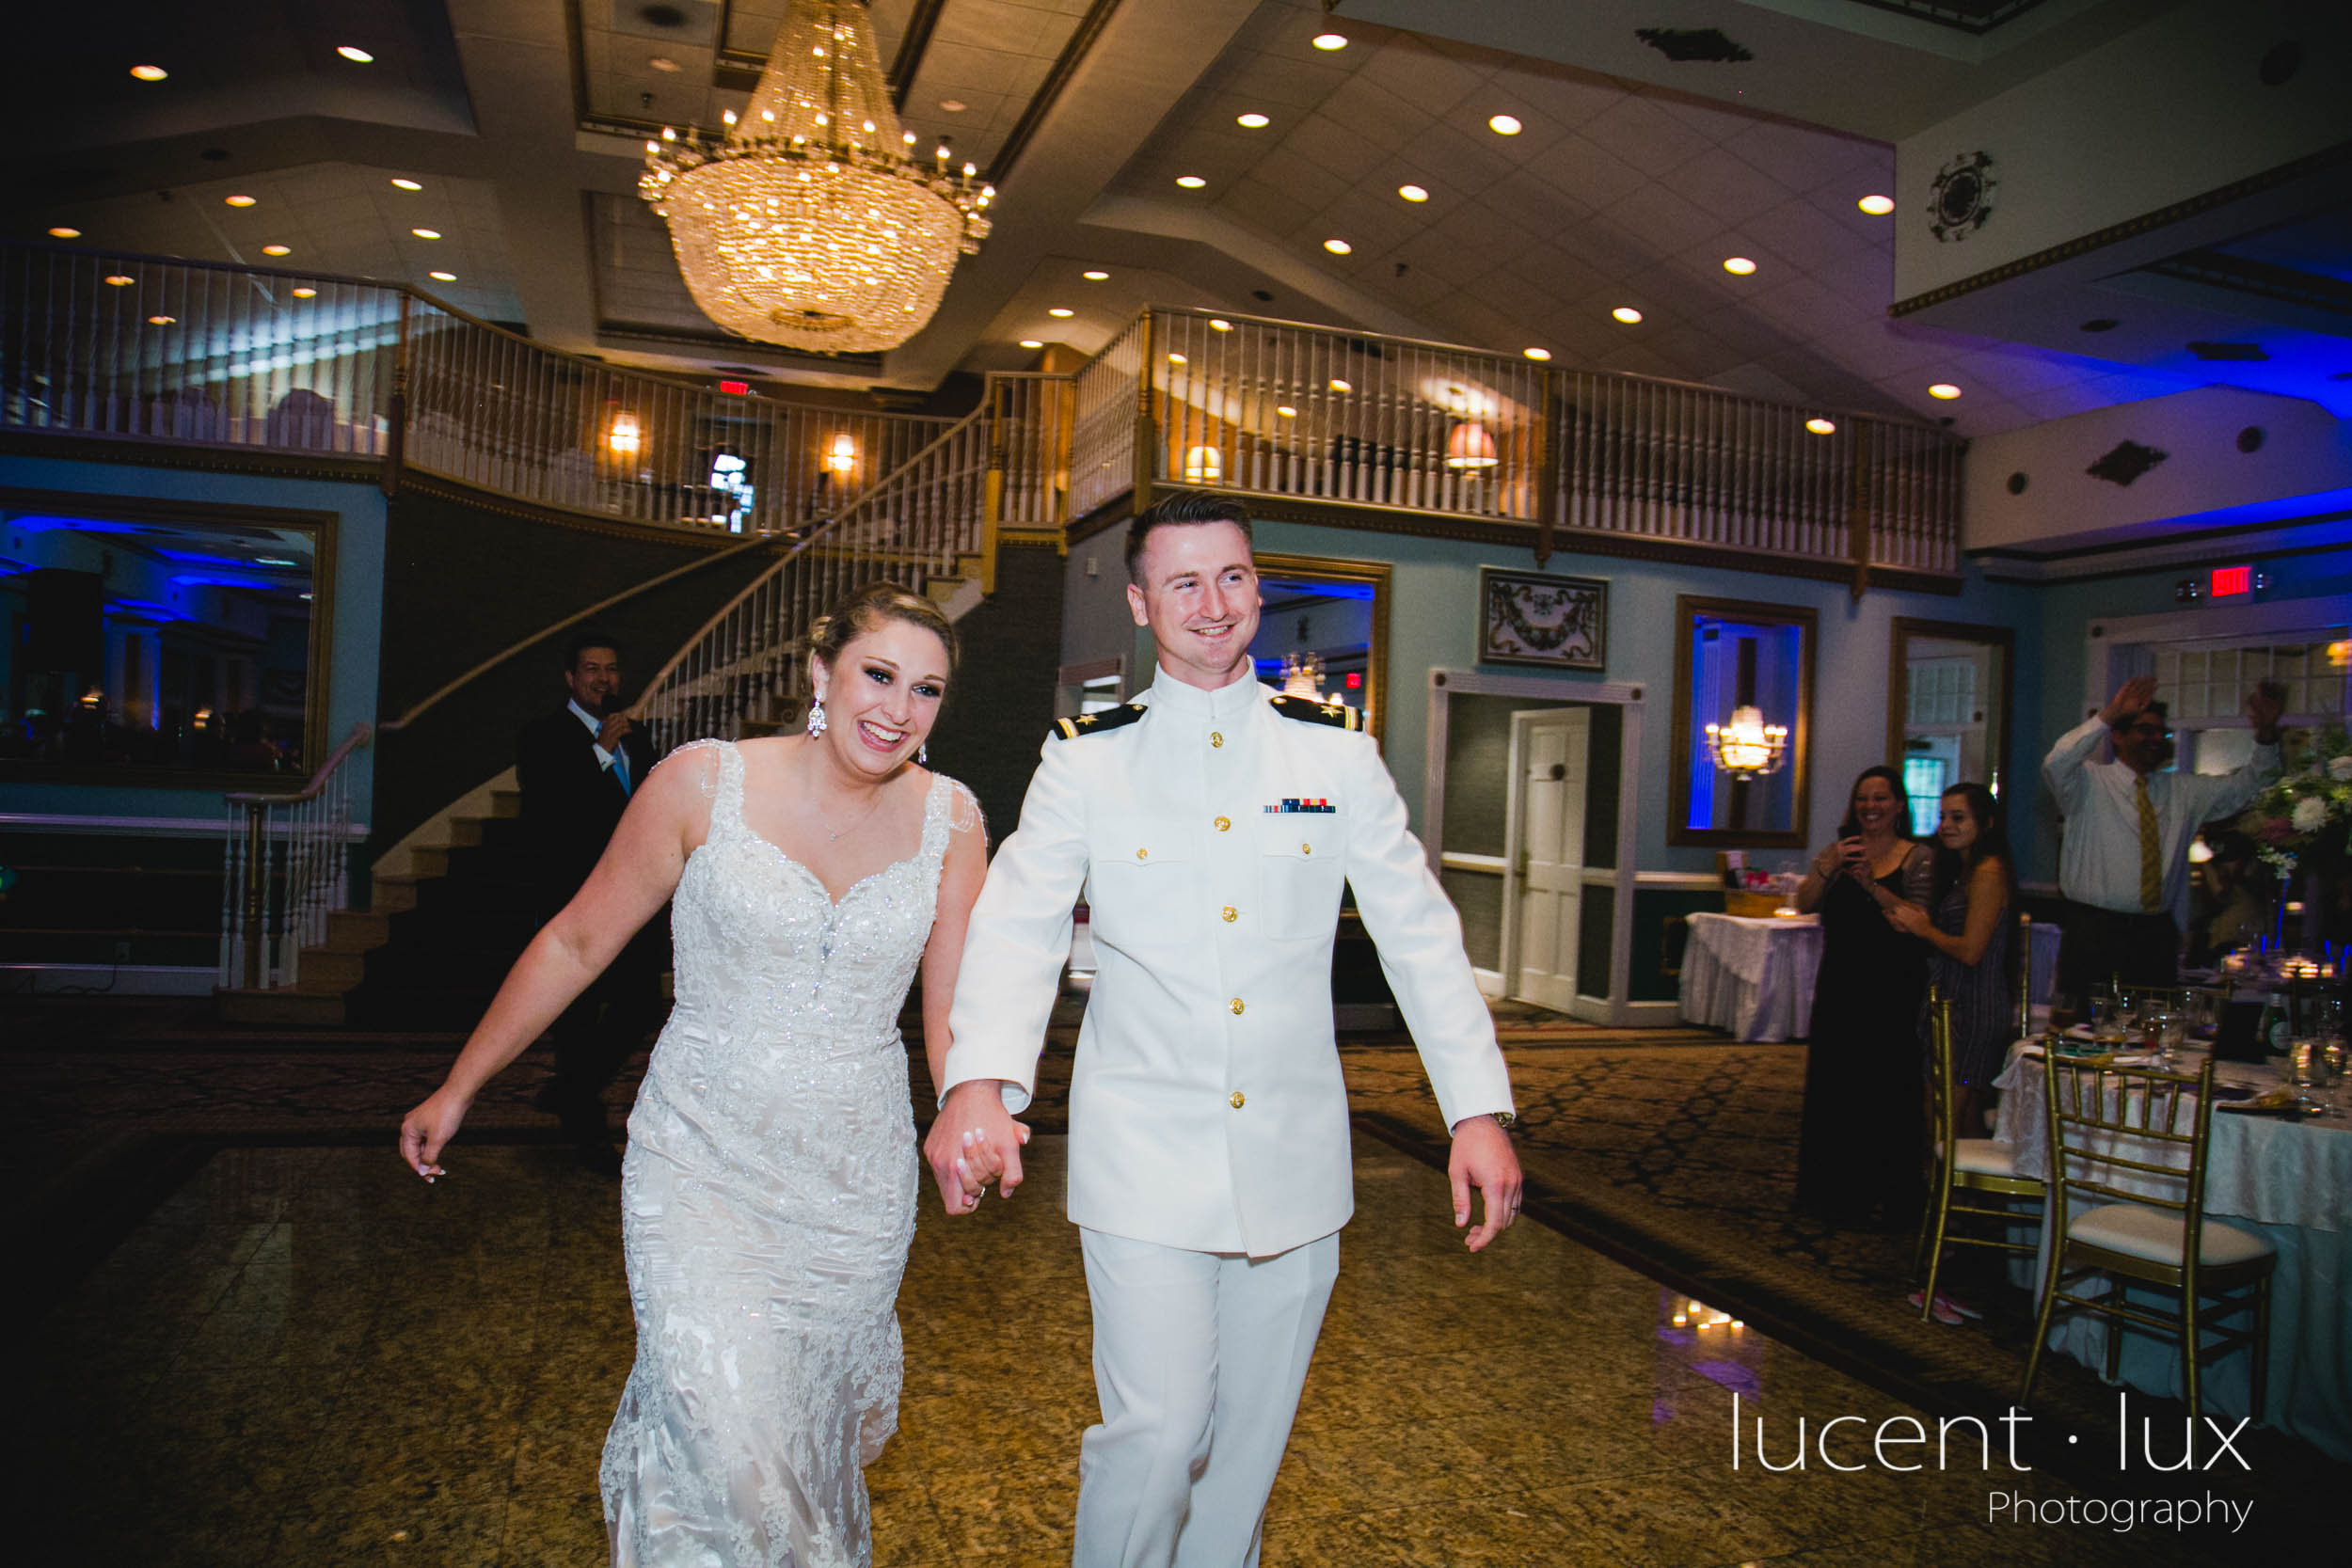 Wedding-Photography-Maryland-Pennsylvania-Photographer-Mendenhall-Inn-Media-Portrait-Event-146.jpg